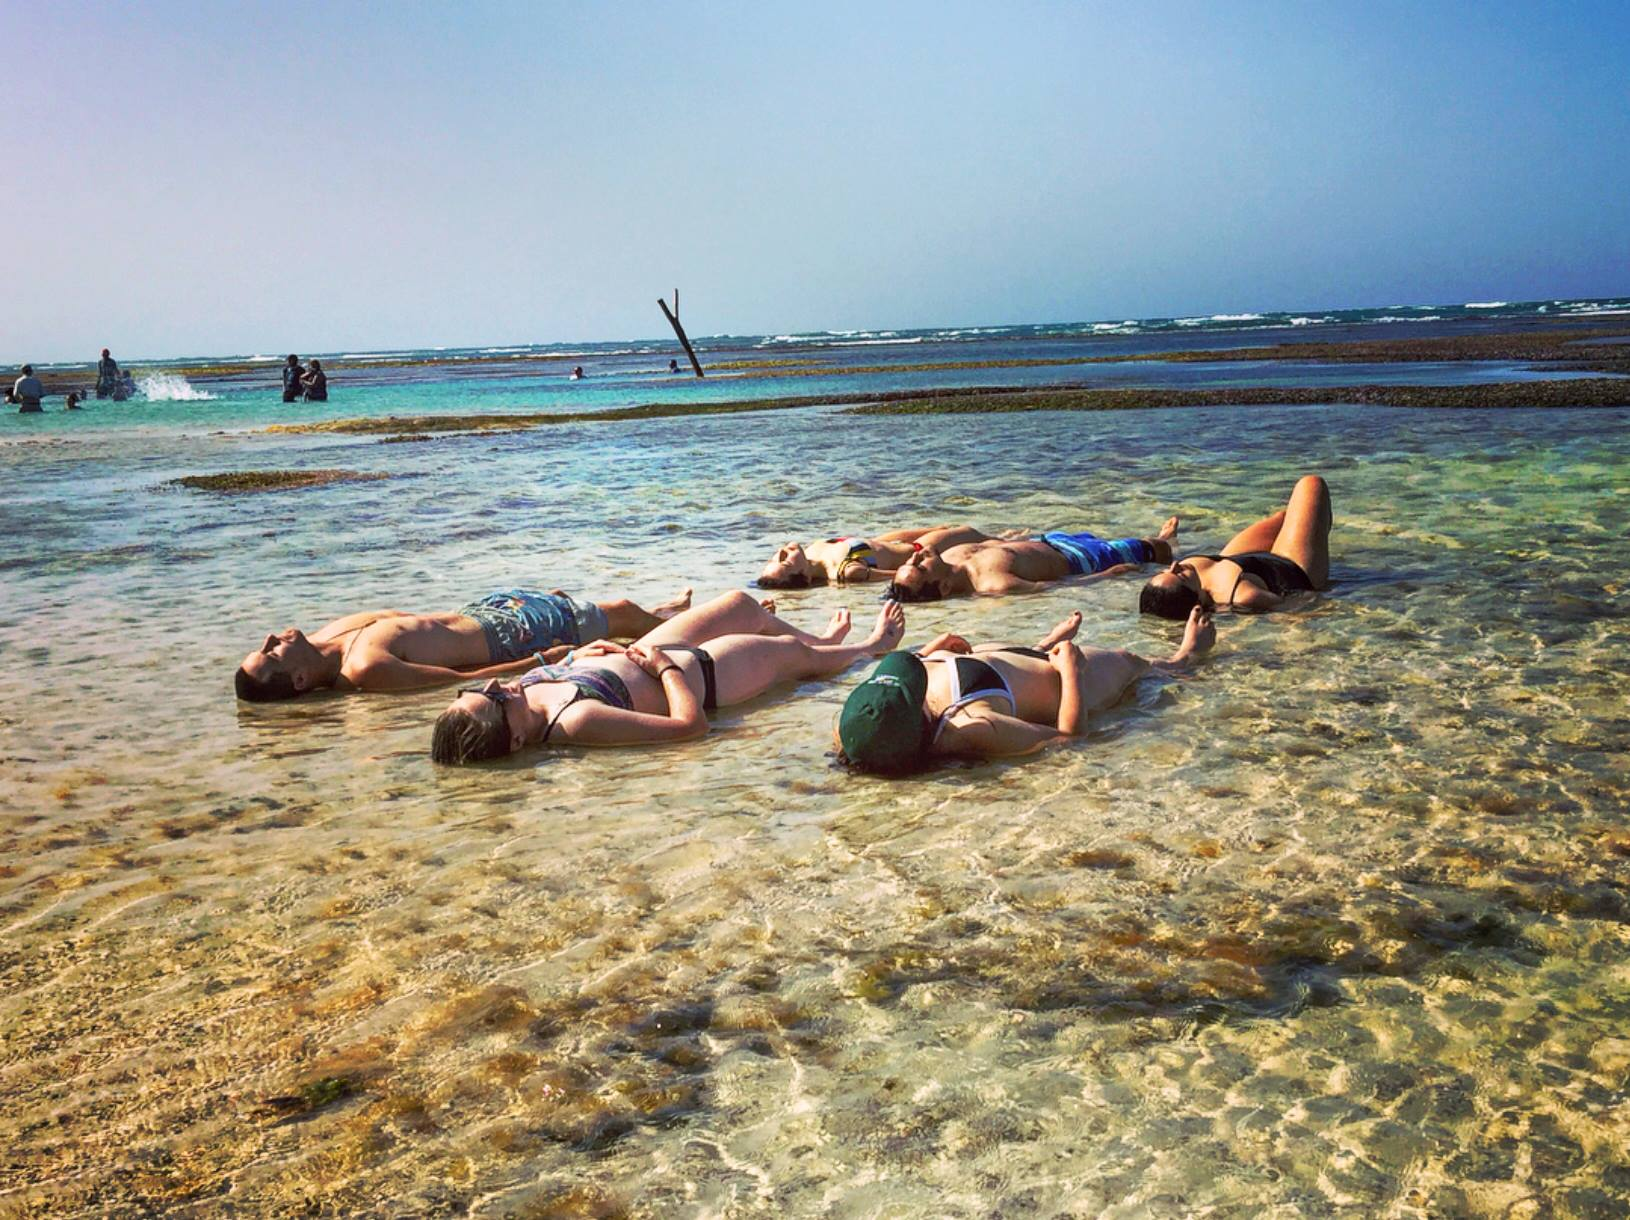 Beach time in the Dominican Republic